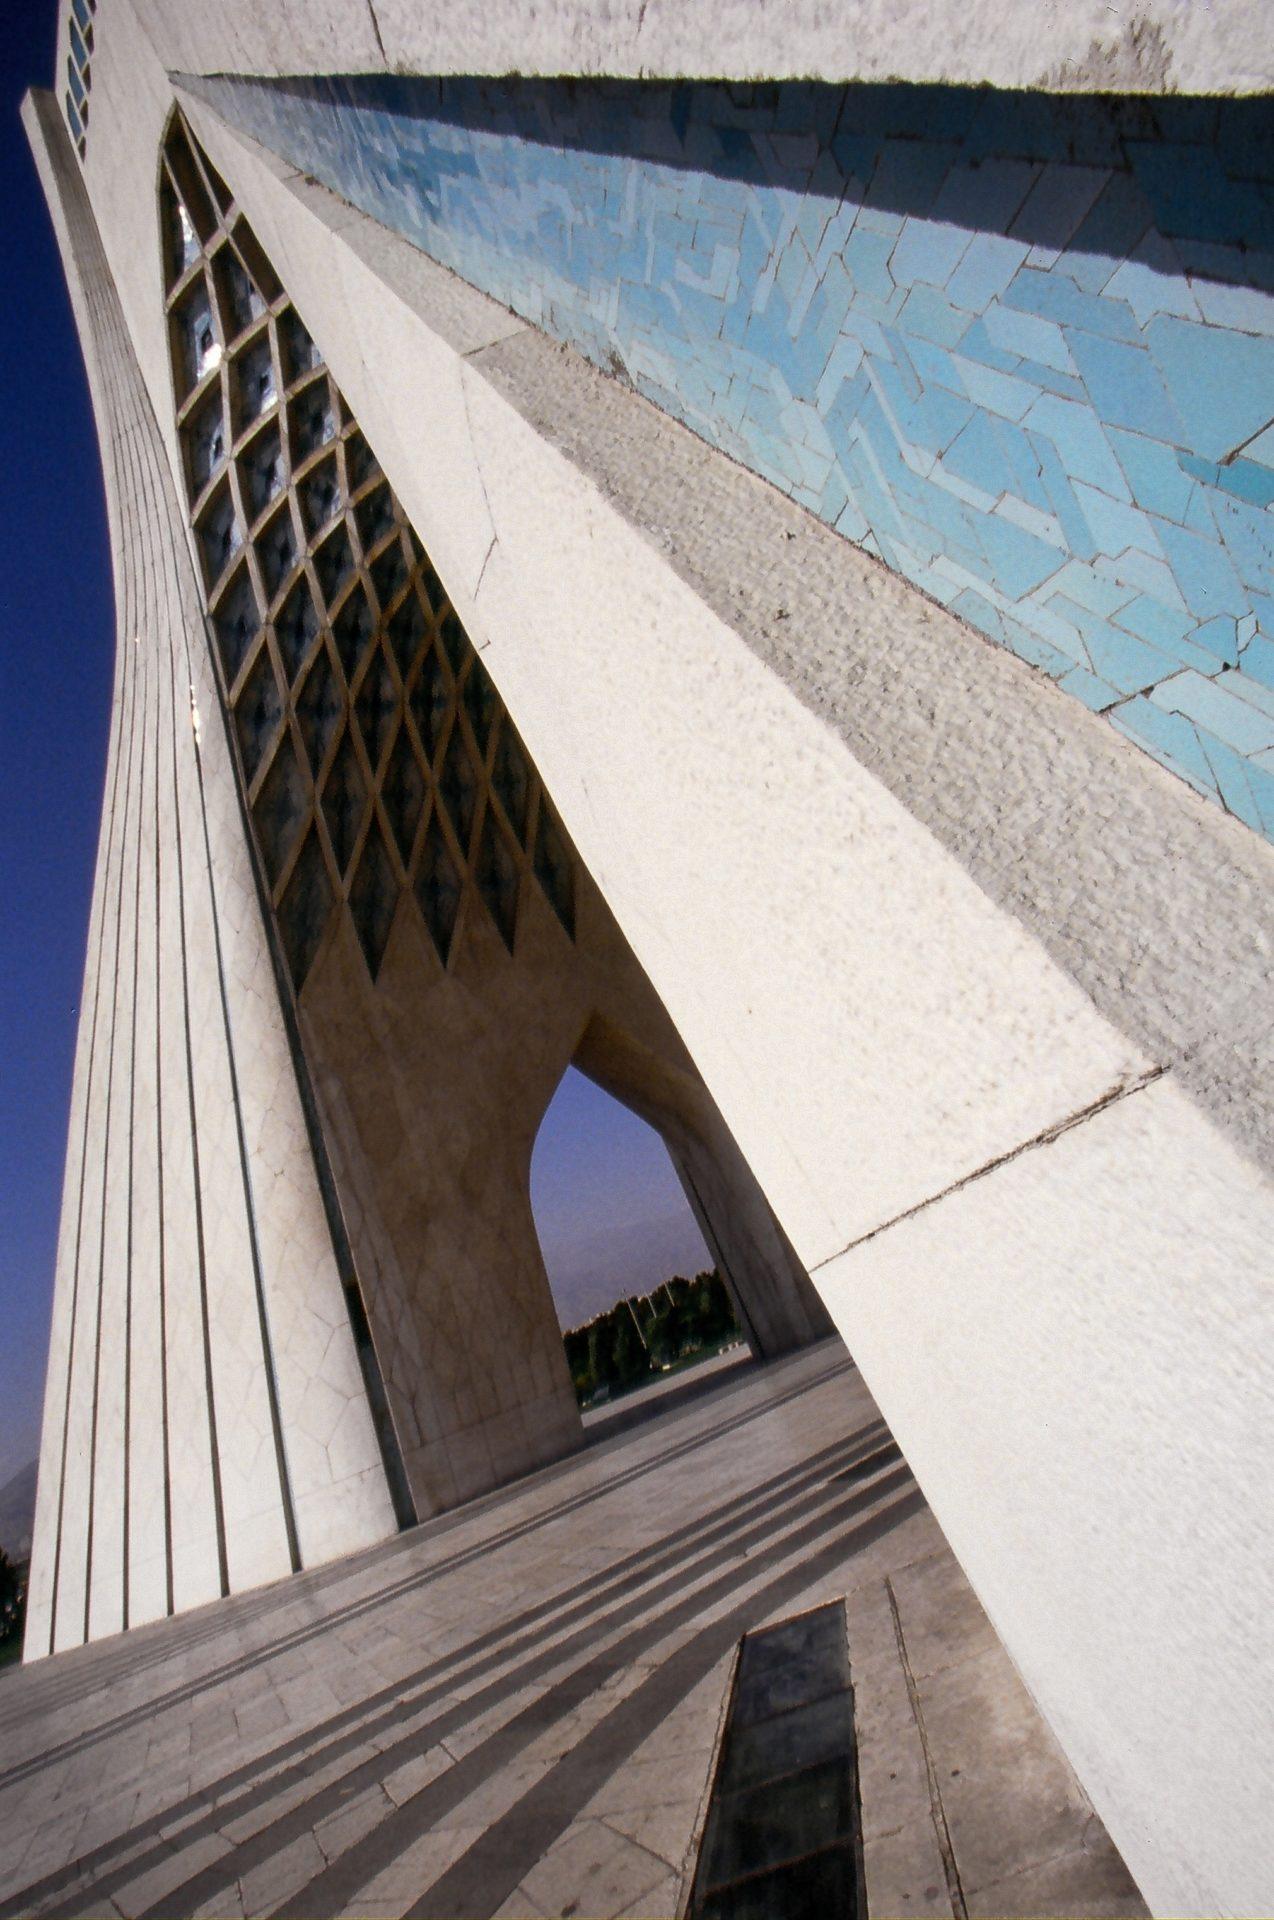 Iran 2003 # 01